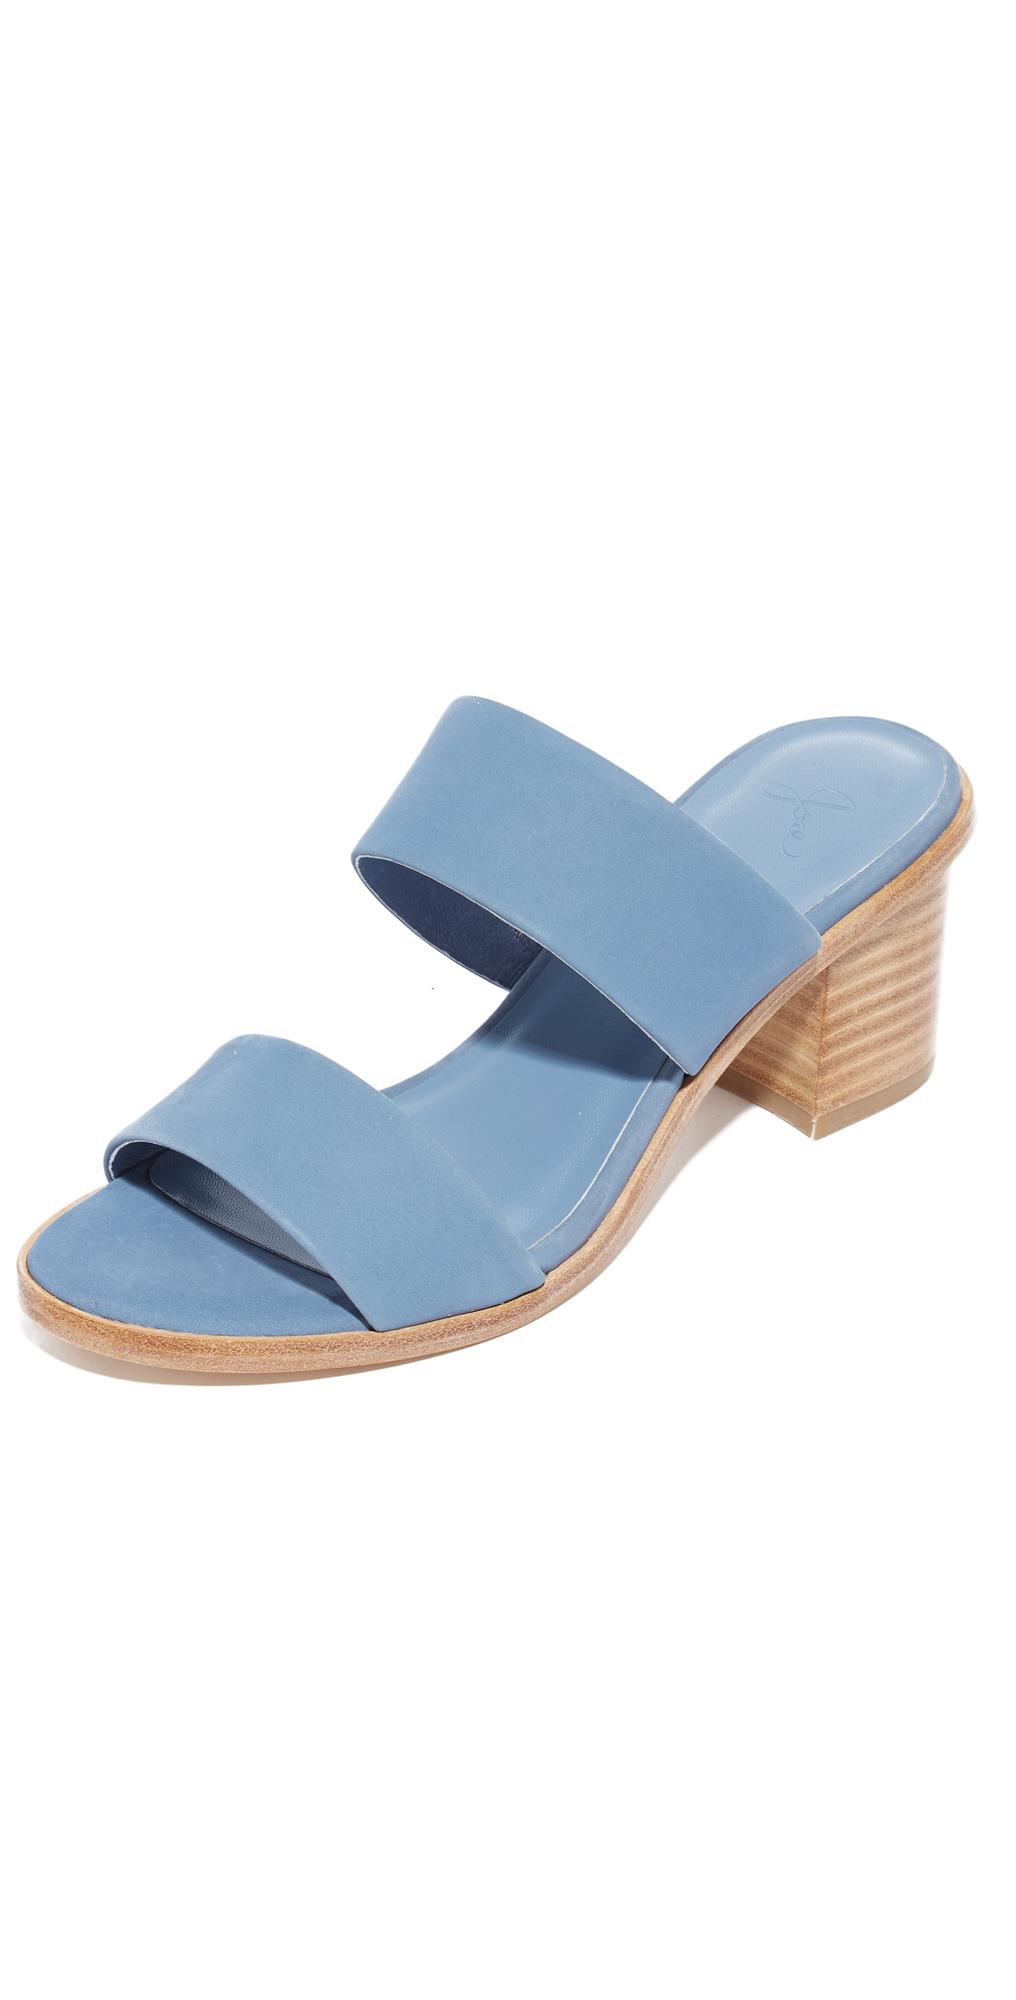 Maha City Sandals Joie